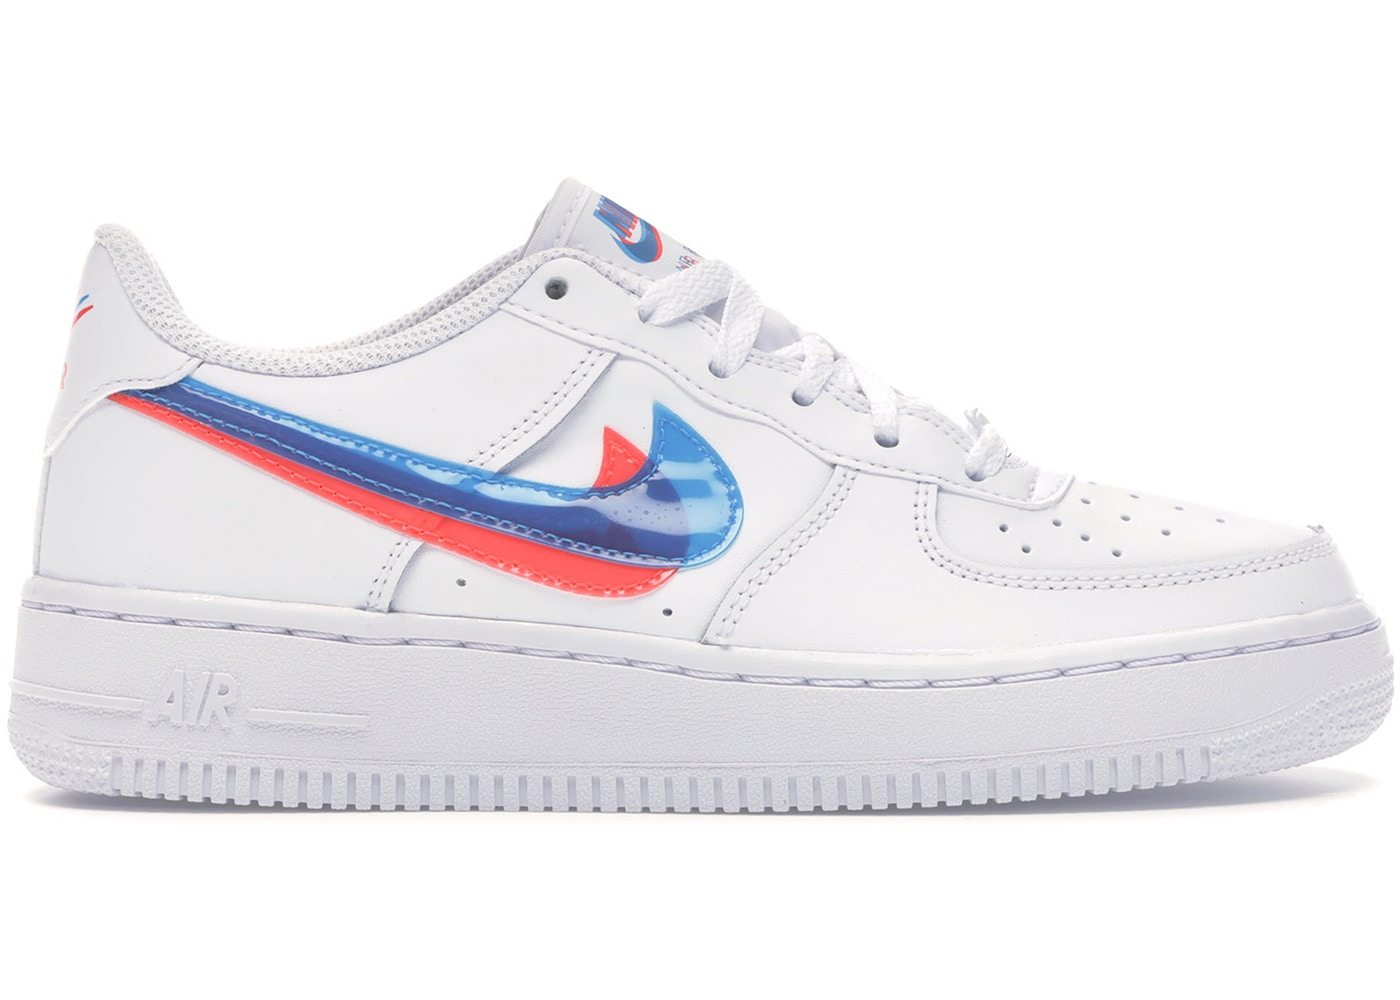 Restock: GS Nike Air Force 1 Low